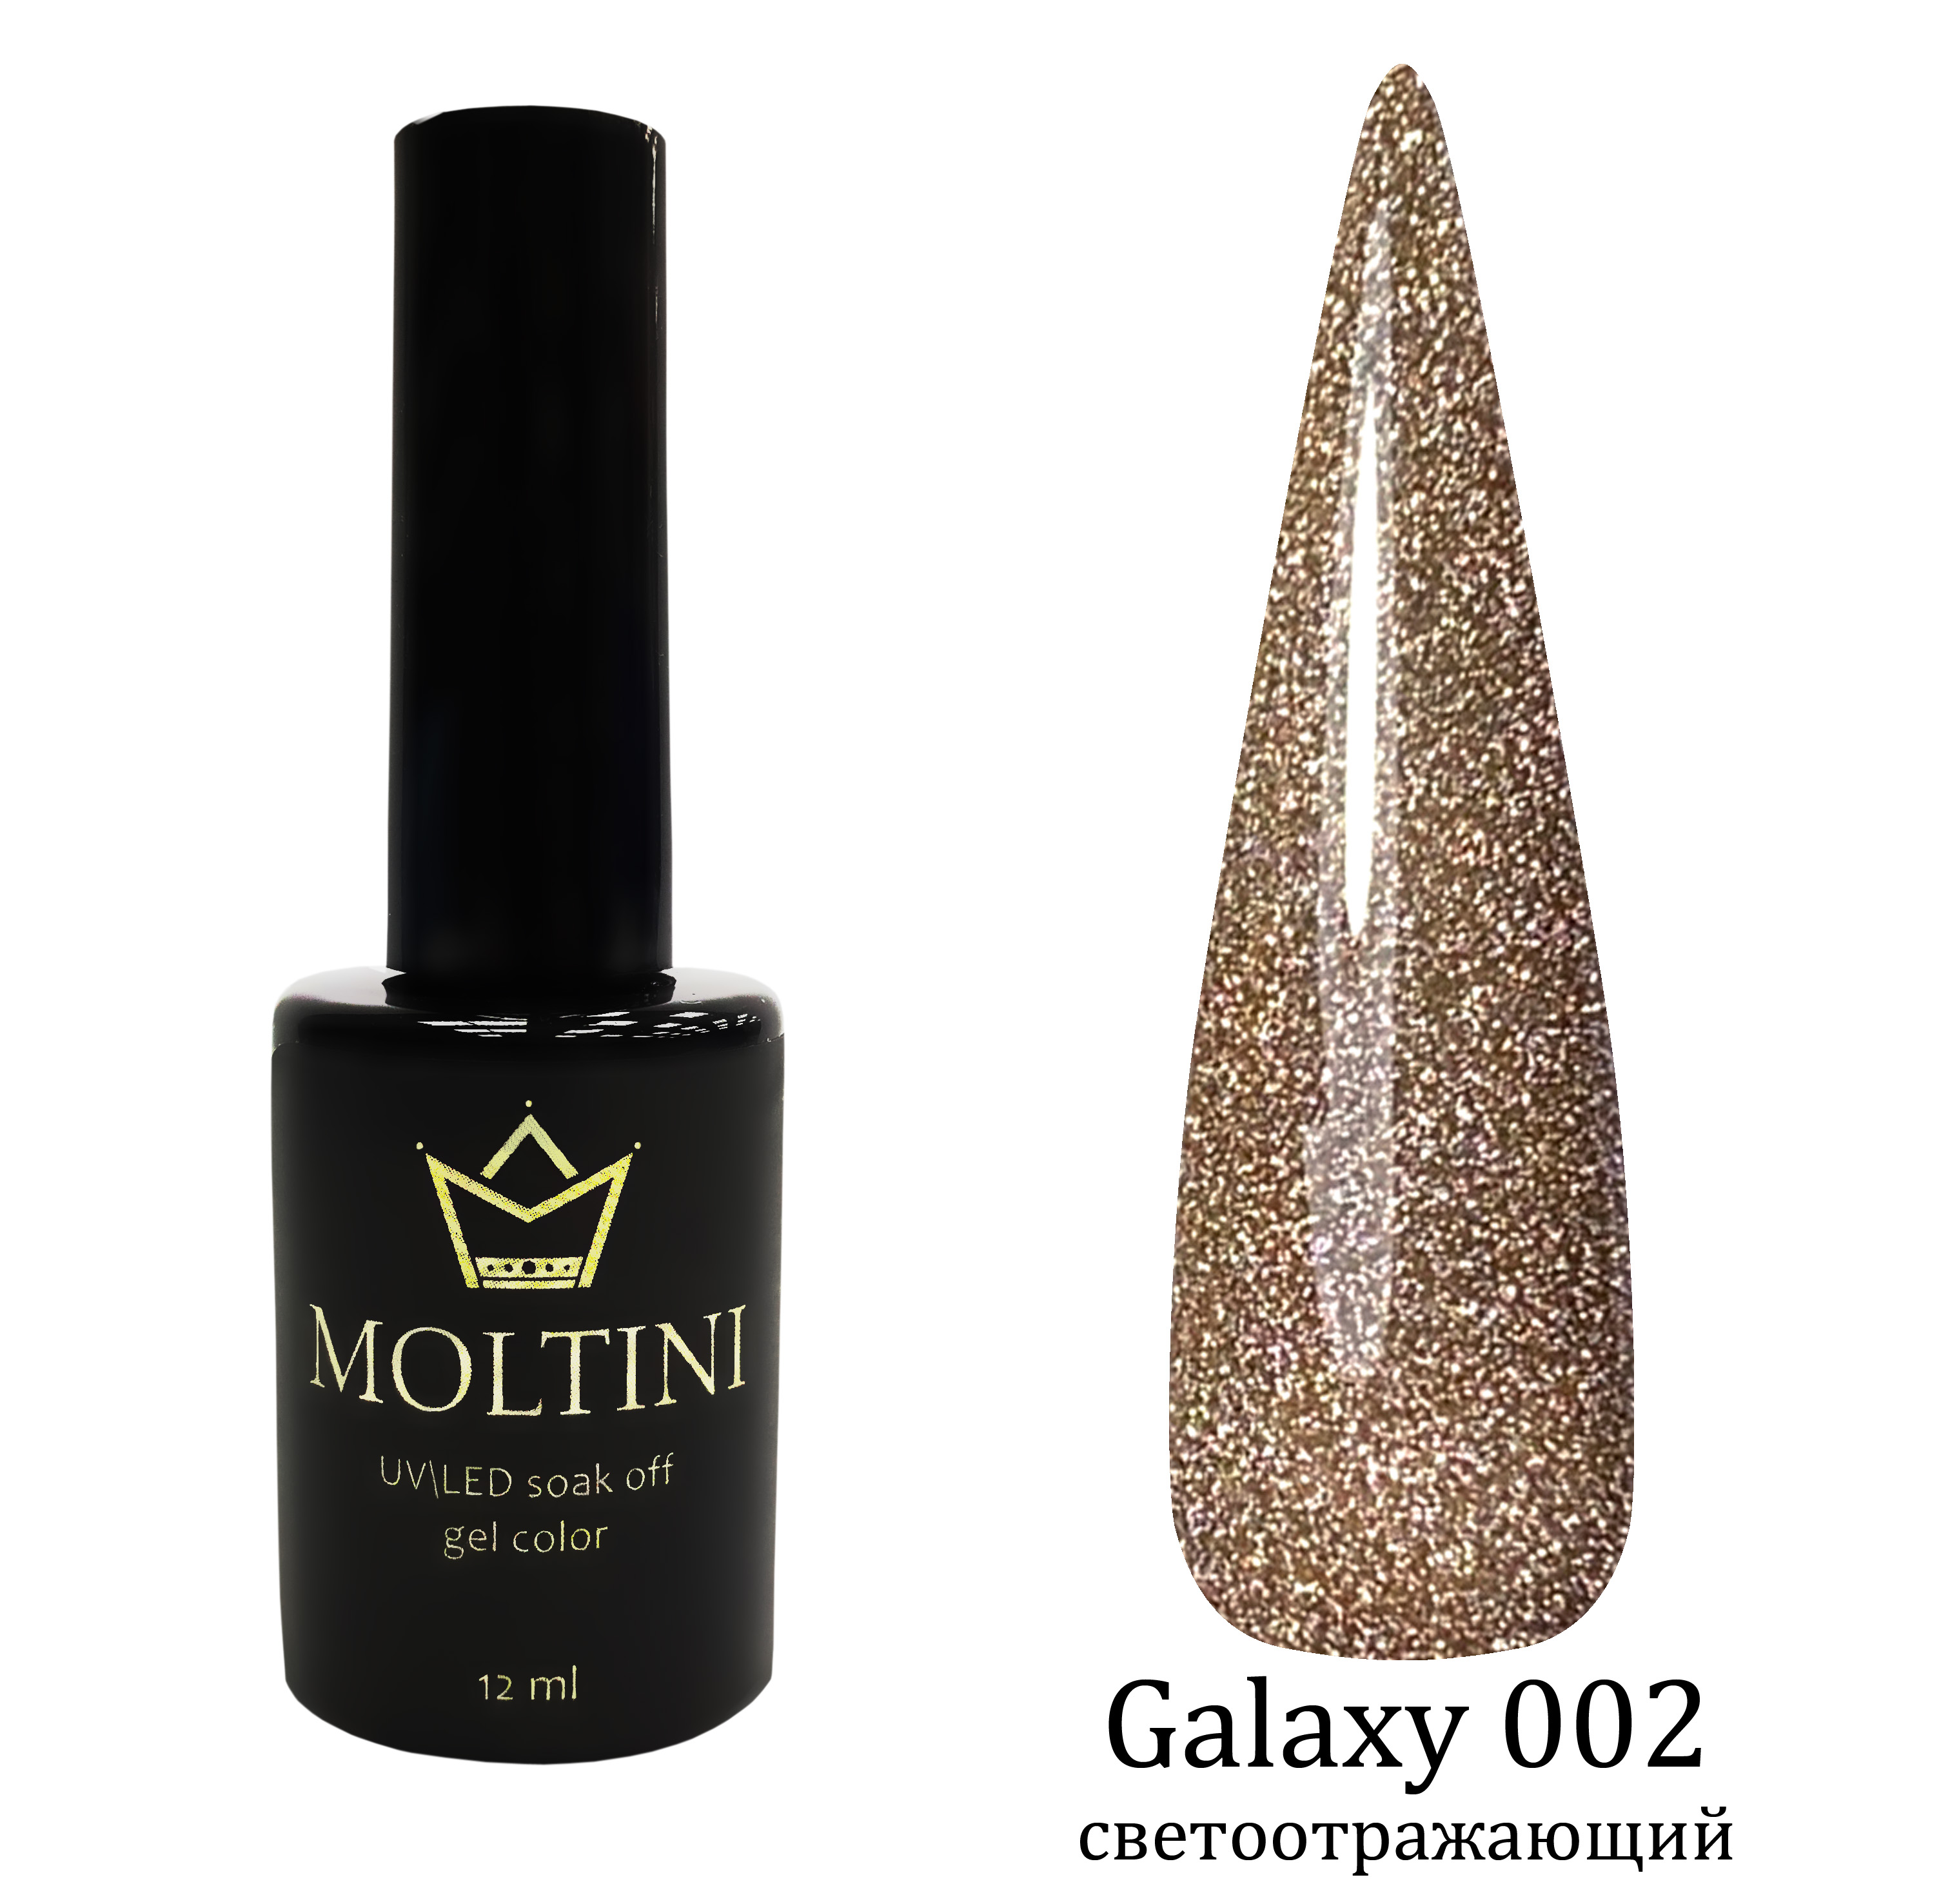 Гель-лак Moltini Galaxy 002, 12 ml